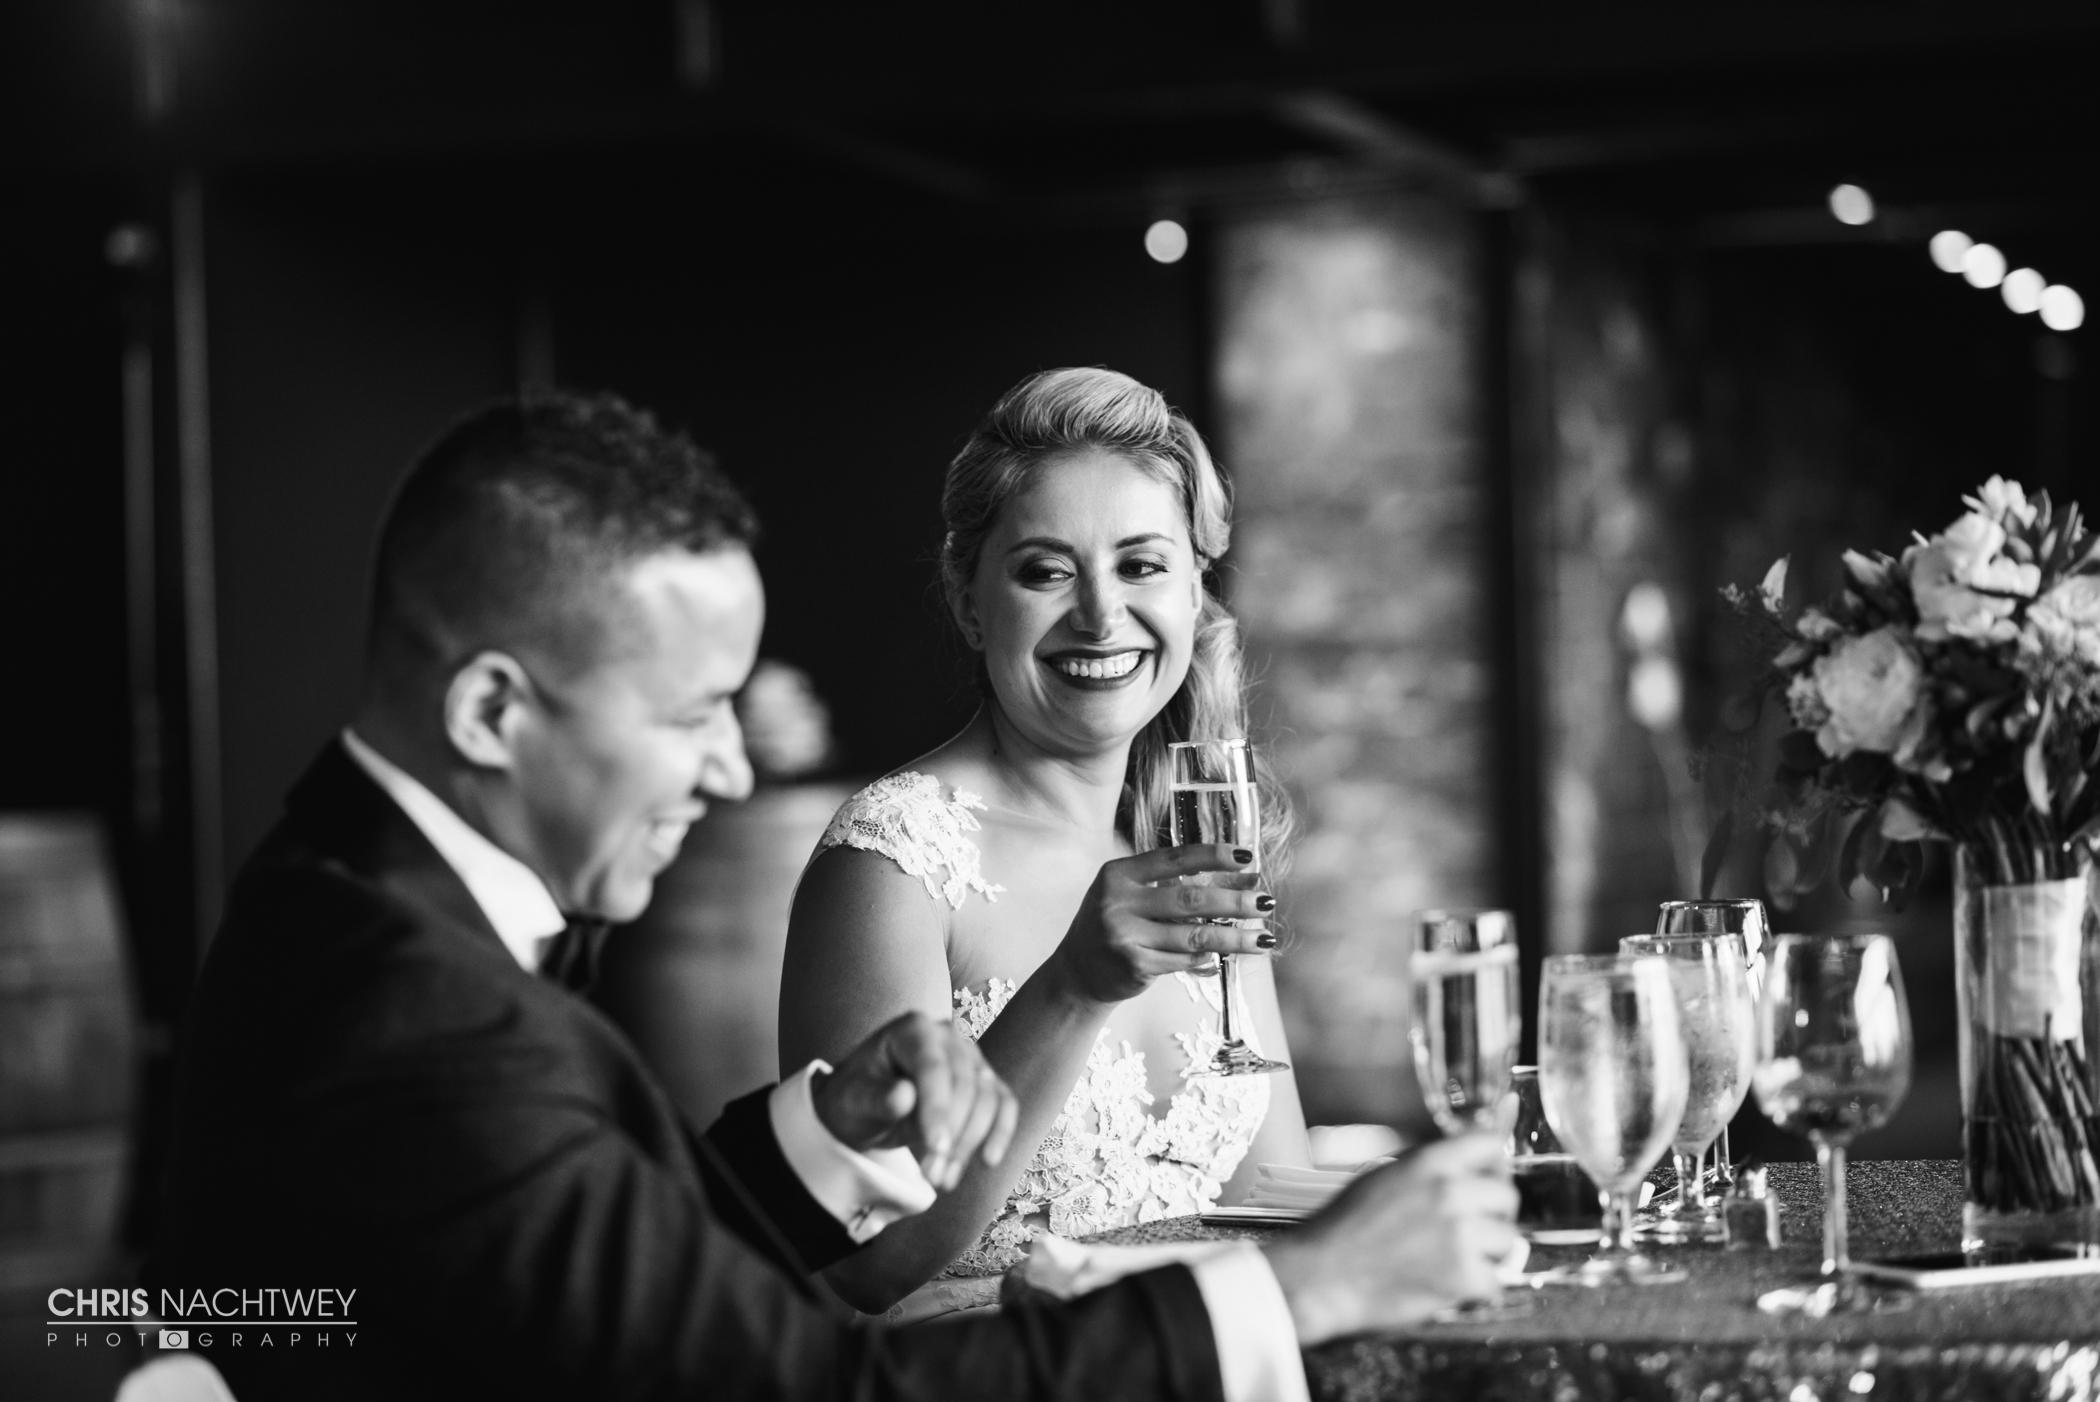 wedding-saltwater-farm-vineyard-photos-stonington-ct-chris-nachtwey-photography-2016-ana-austin-33.jpg